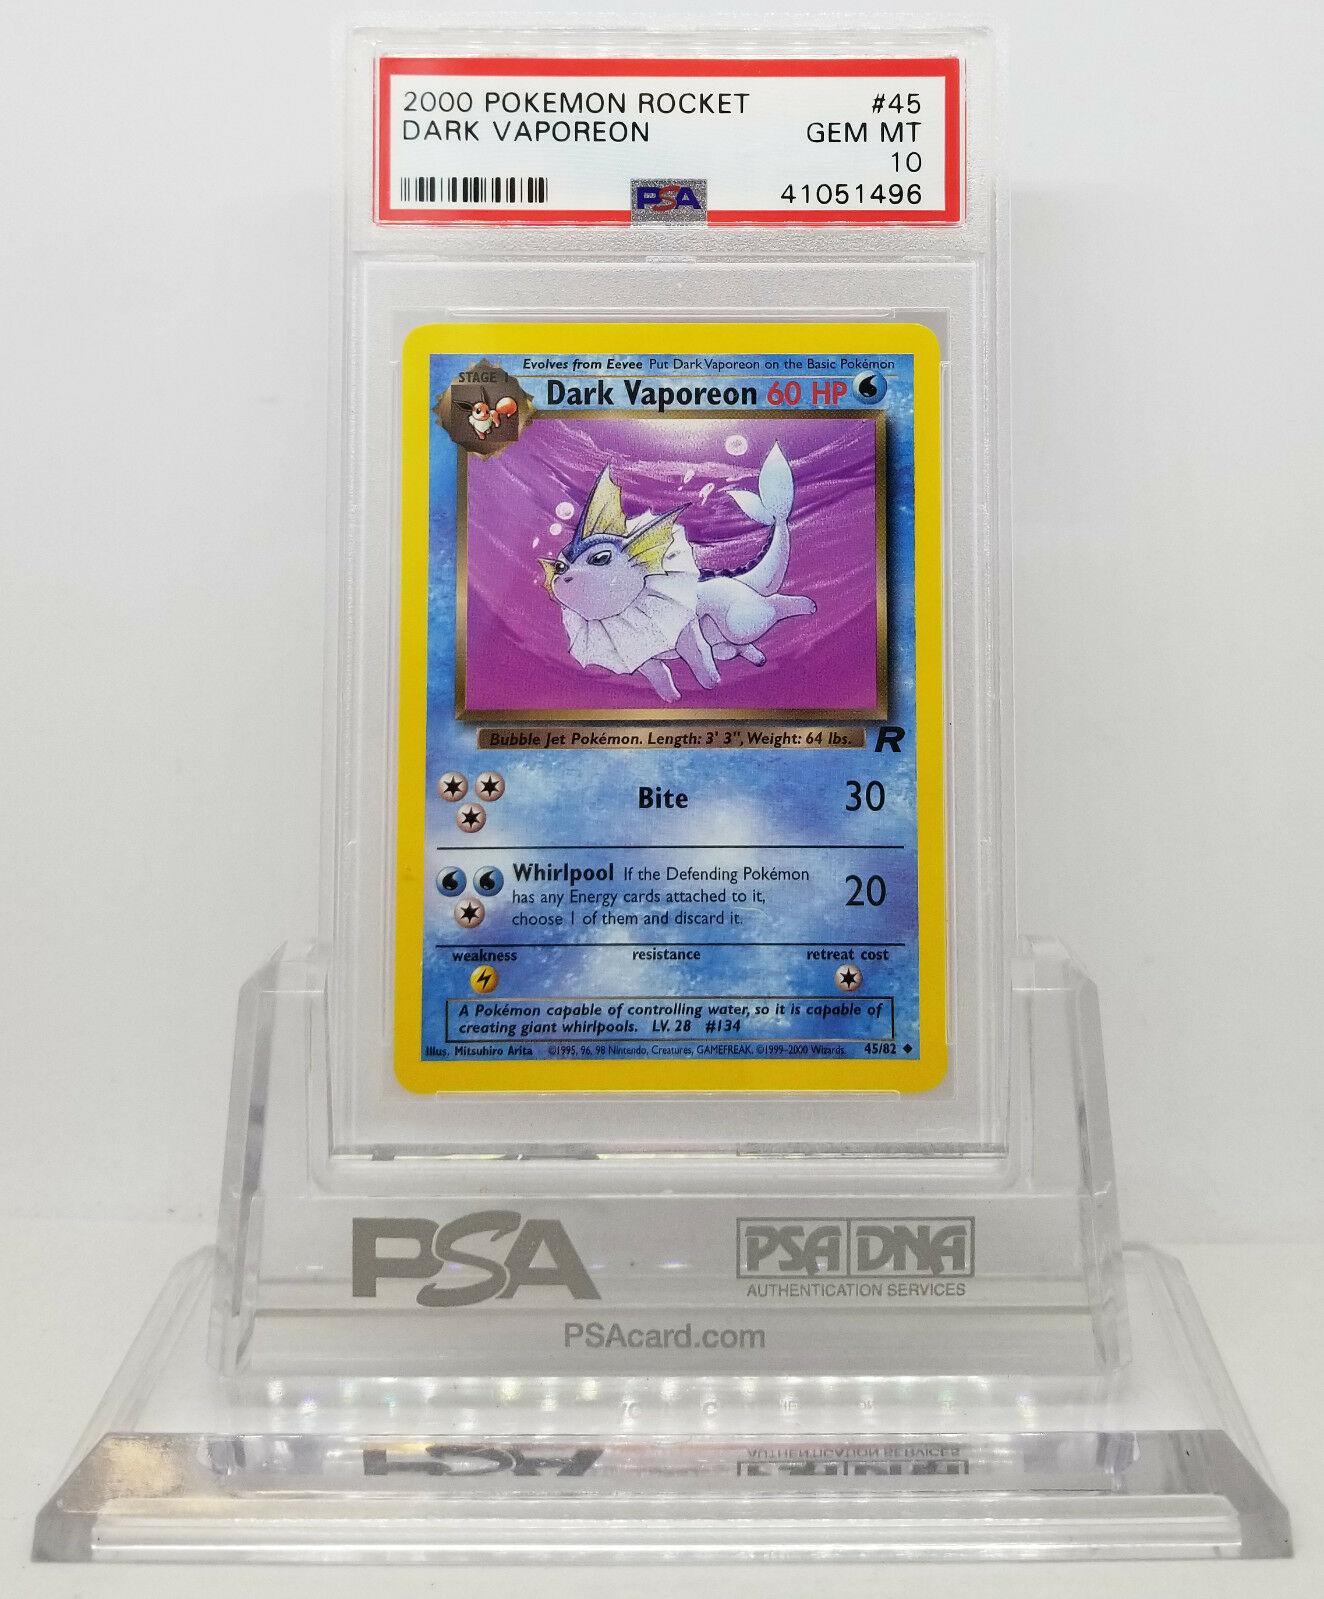 Pokemon 1ST EDTION EX TEAM ROCKET DARK VAPOREON 45 CARD PSA 10 GEM MINT